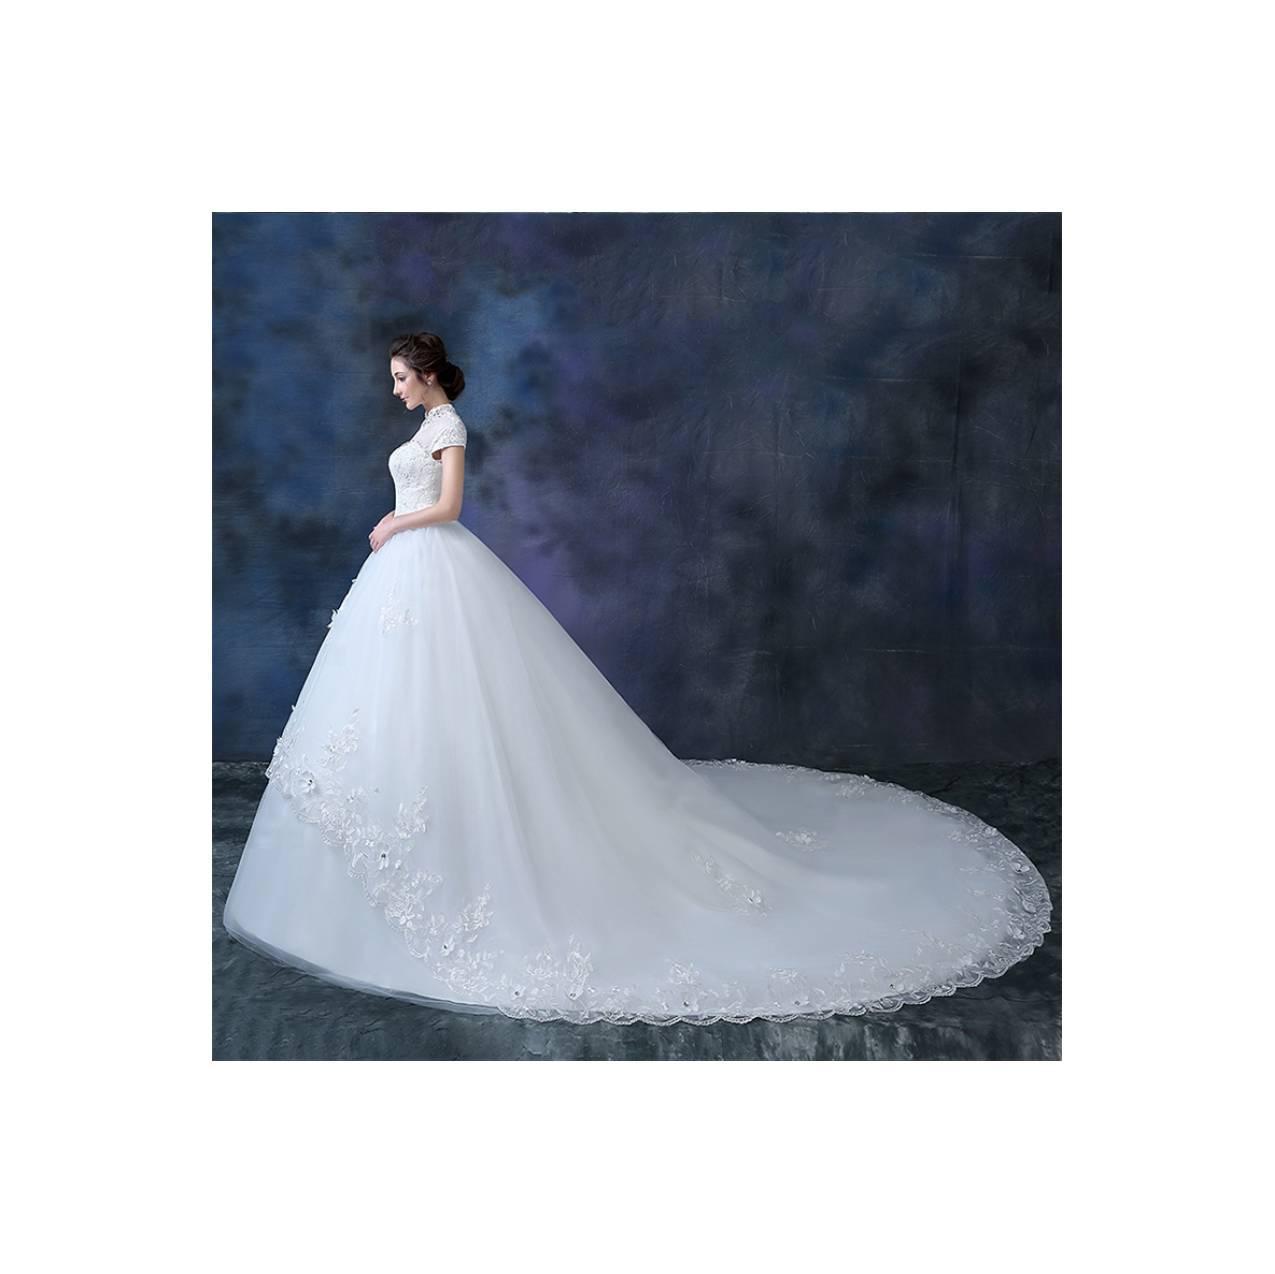 Gaun Pengantin Busana Wanita Baju Pengantin Muslim Wedding Dress Butik